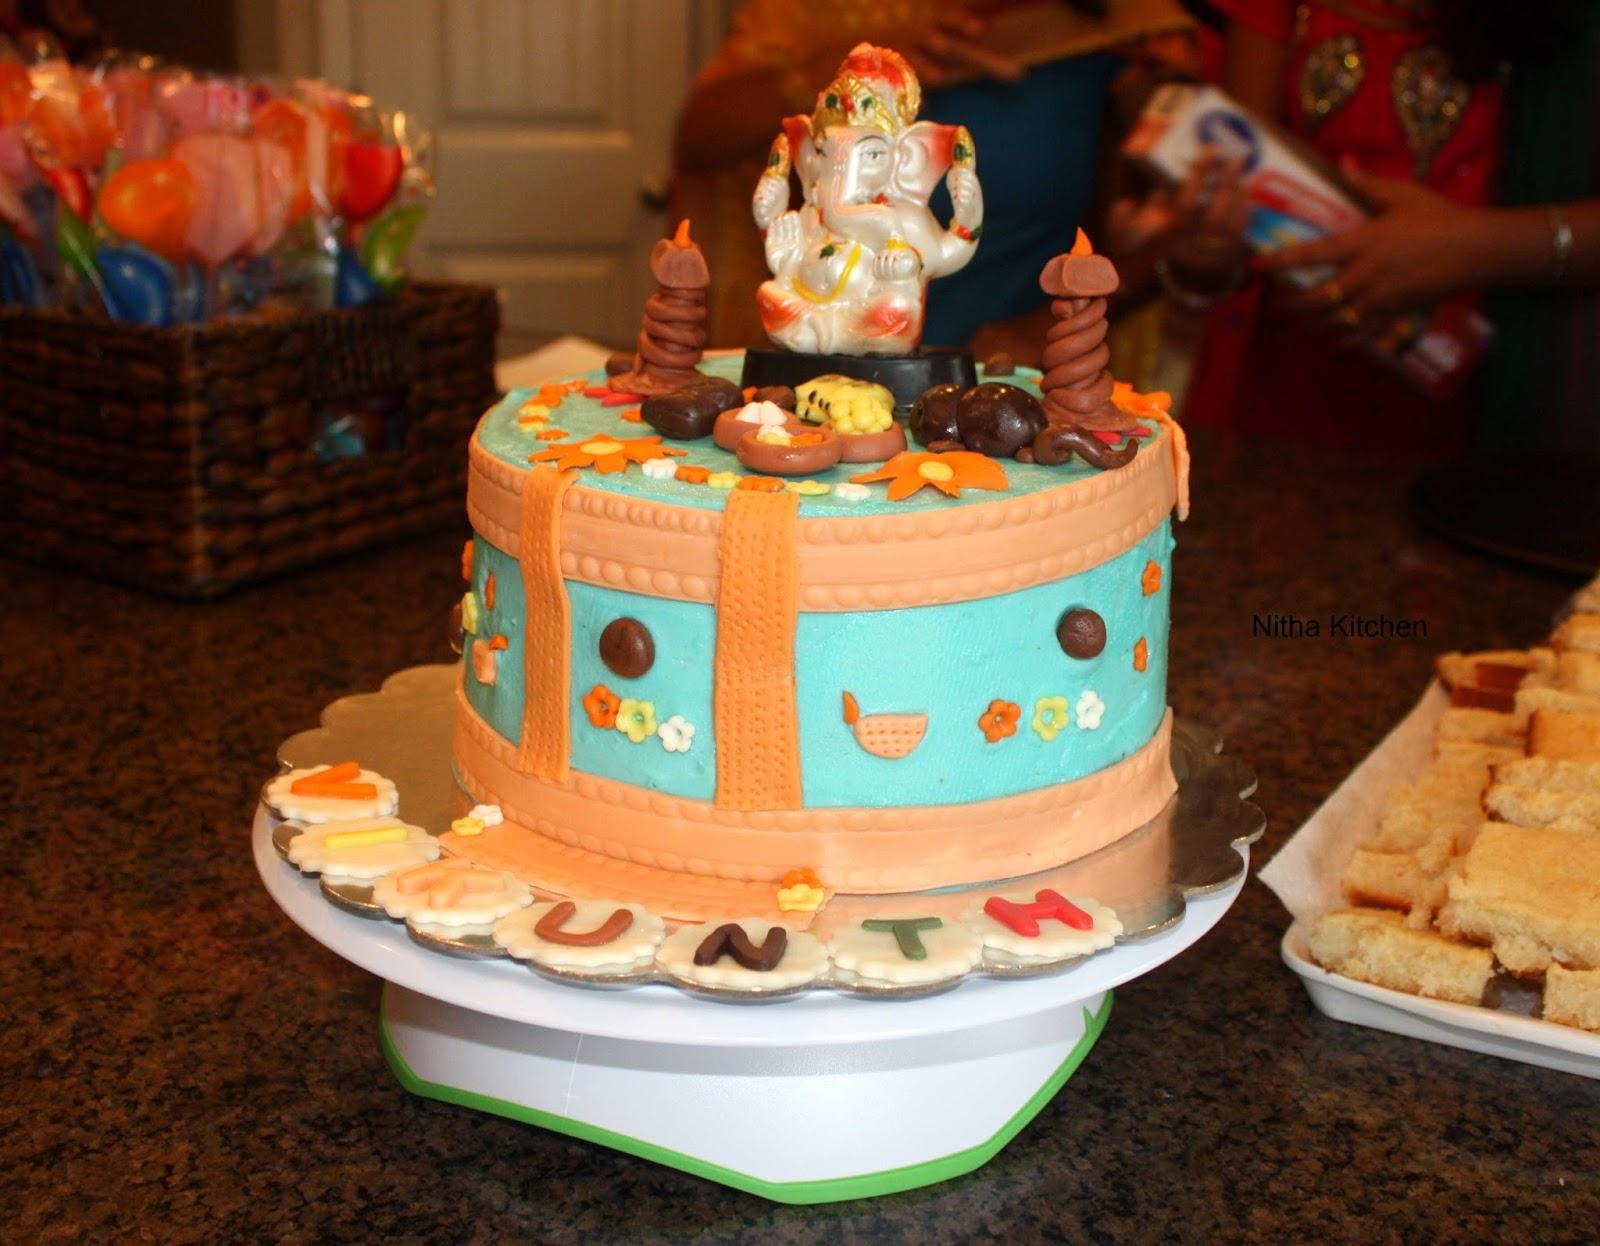 Ganesh Bday Cake Images : Nitha Kitchen: Ganesh Themed Buttercream Cake with Eggless ...